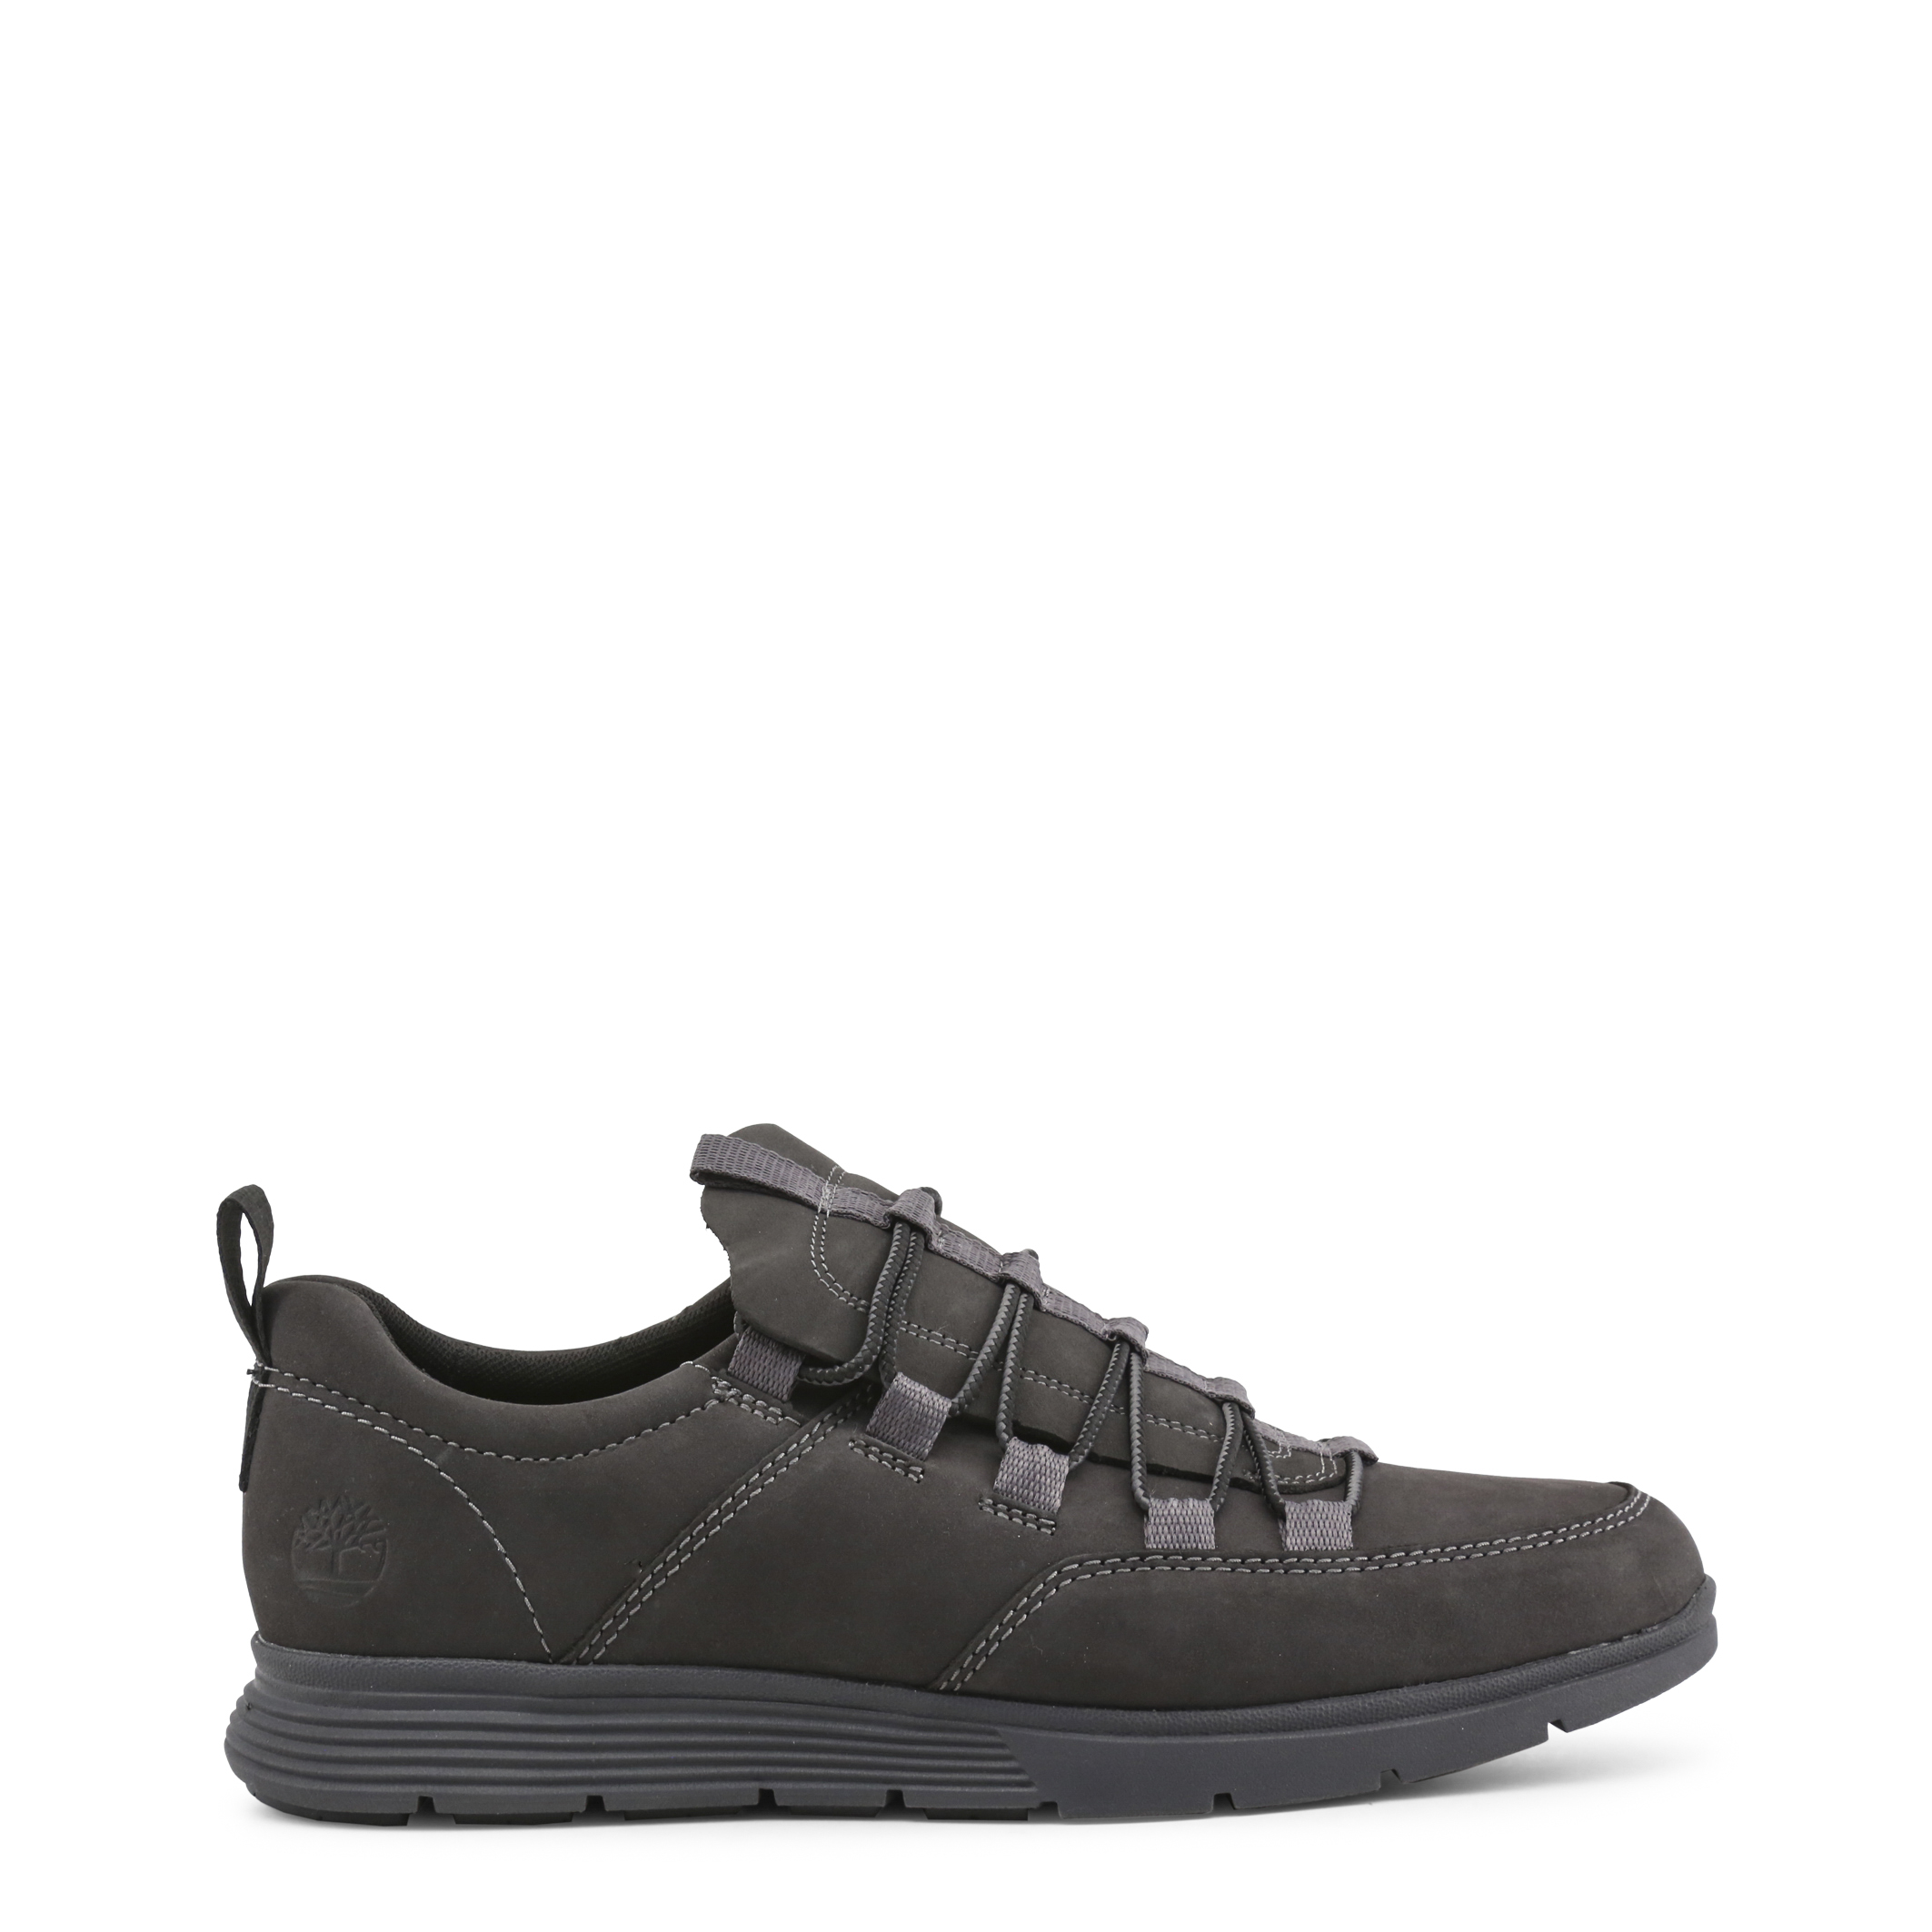 Chaussures   Timberland KILLINGTON_TB0A1O grey